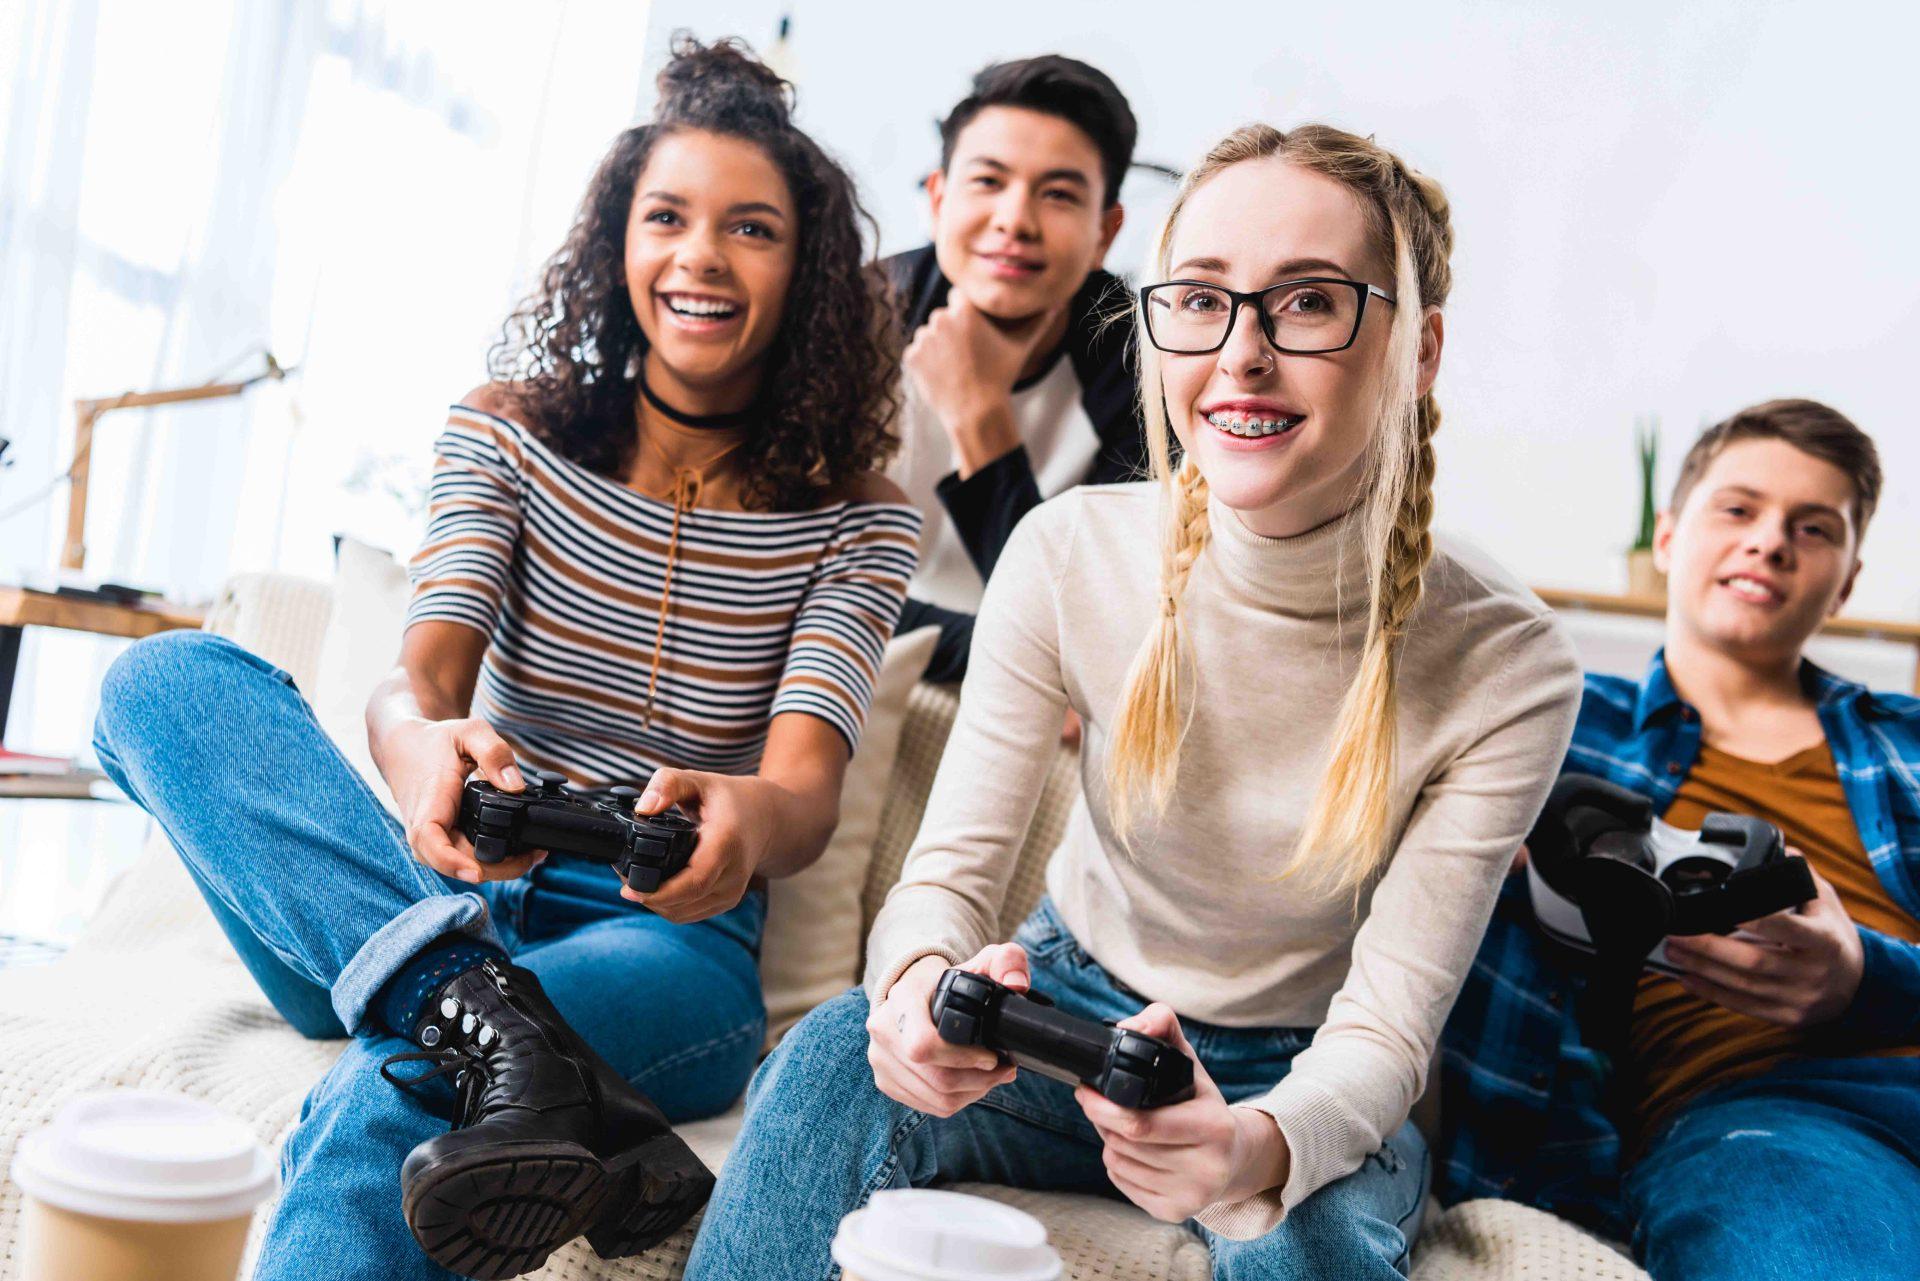 Group of teens gaming